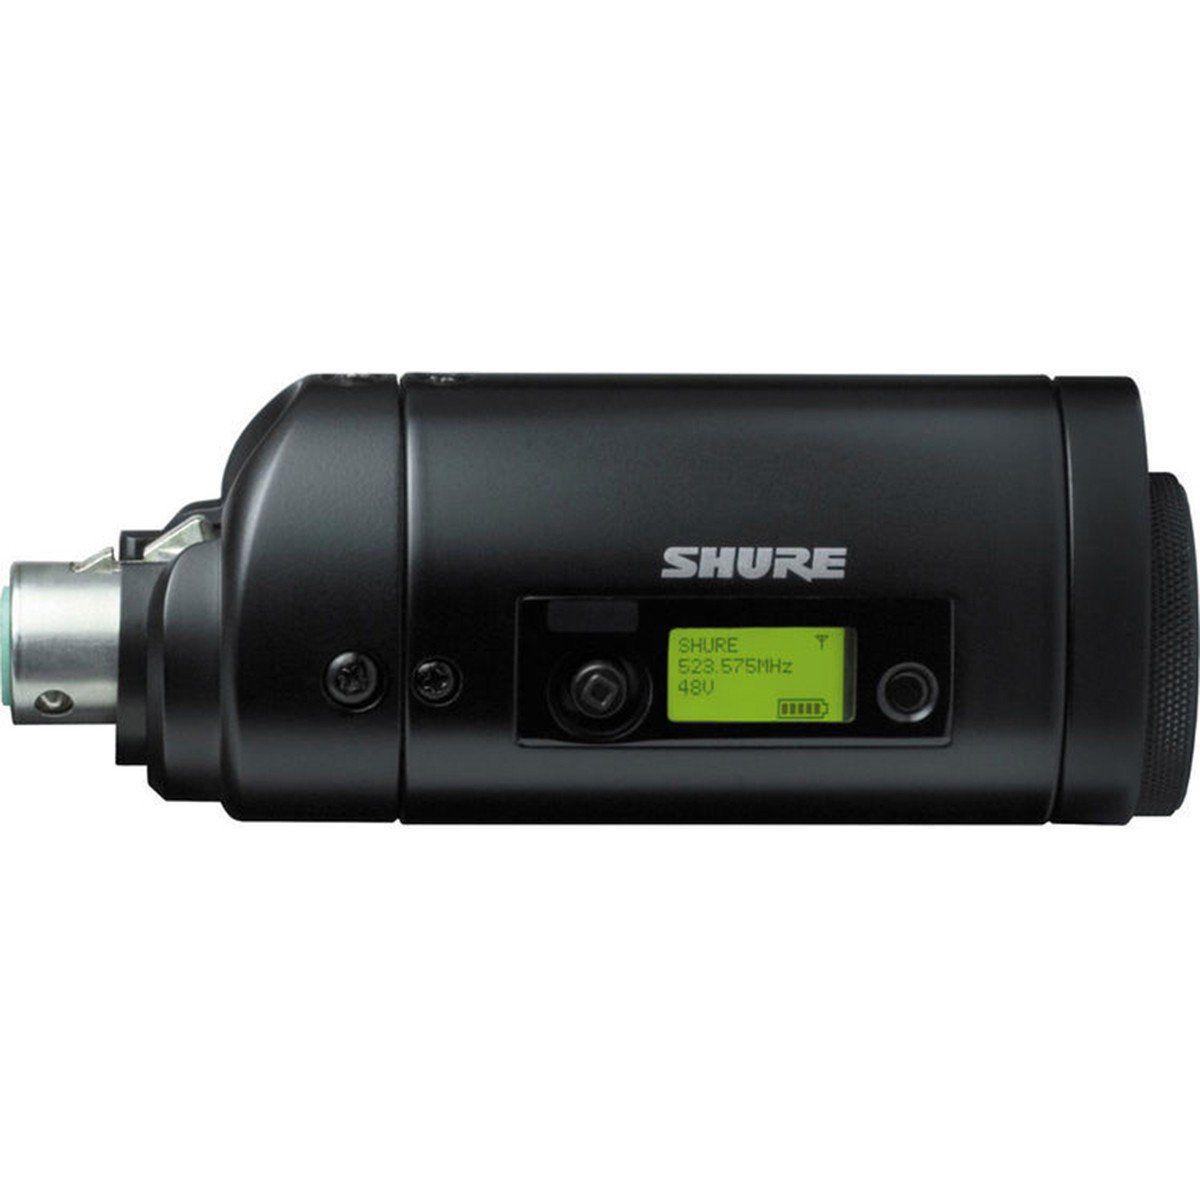 Shure UR3 Plug-On Transmissor para Sistemas sem Fio UHF-R